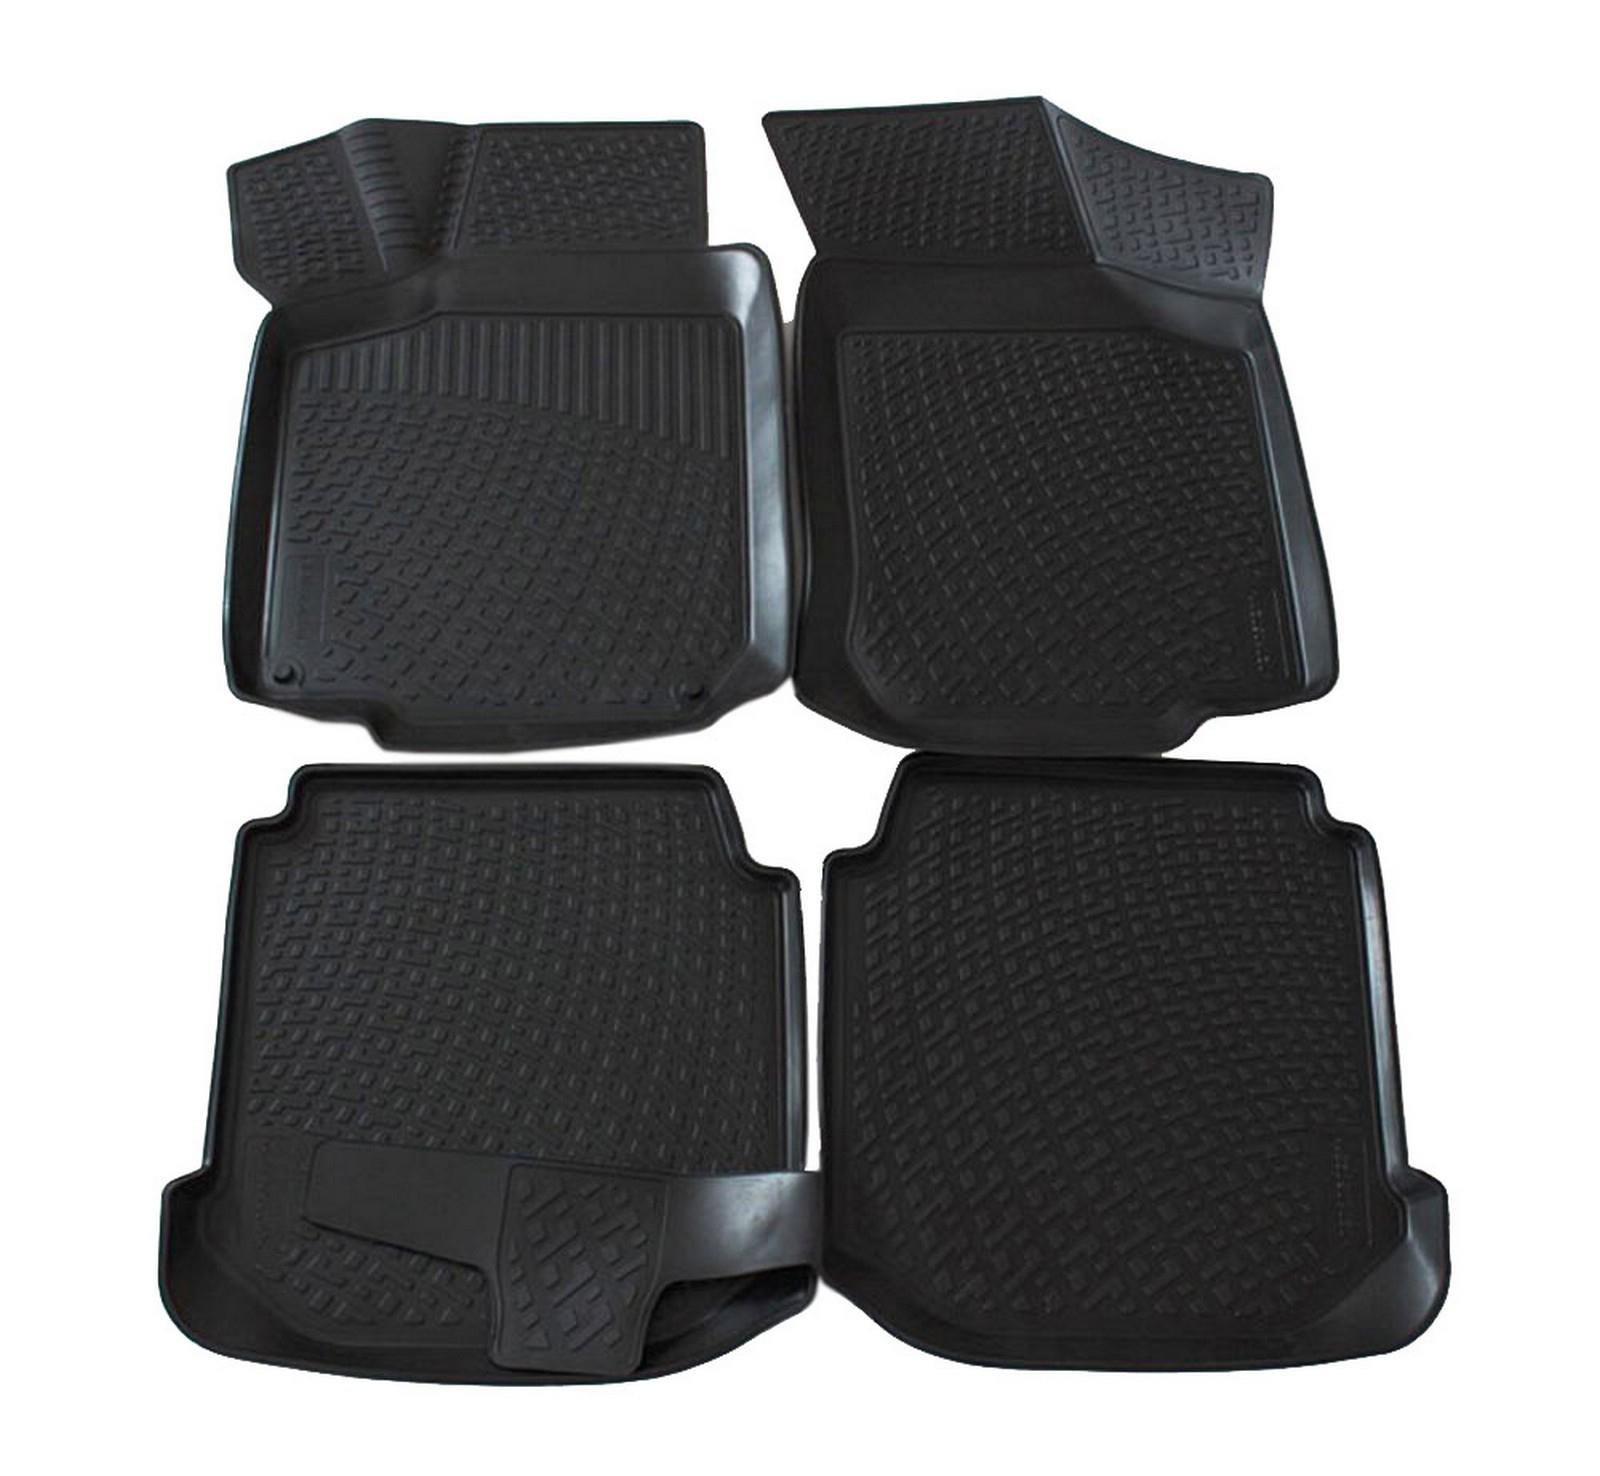 Poza cu Covorase din cauciuc tip tavita Premium, Seat Leon, 2005-2012